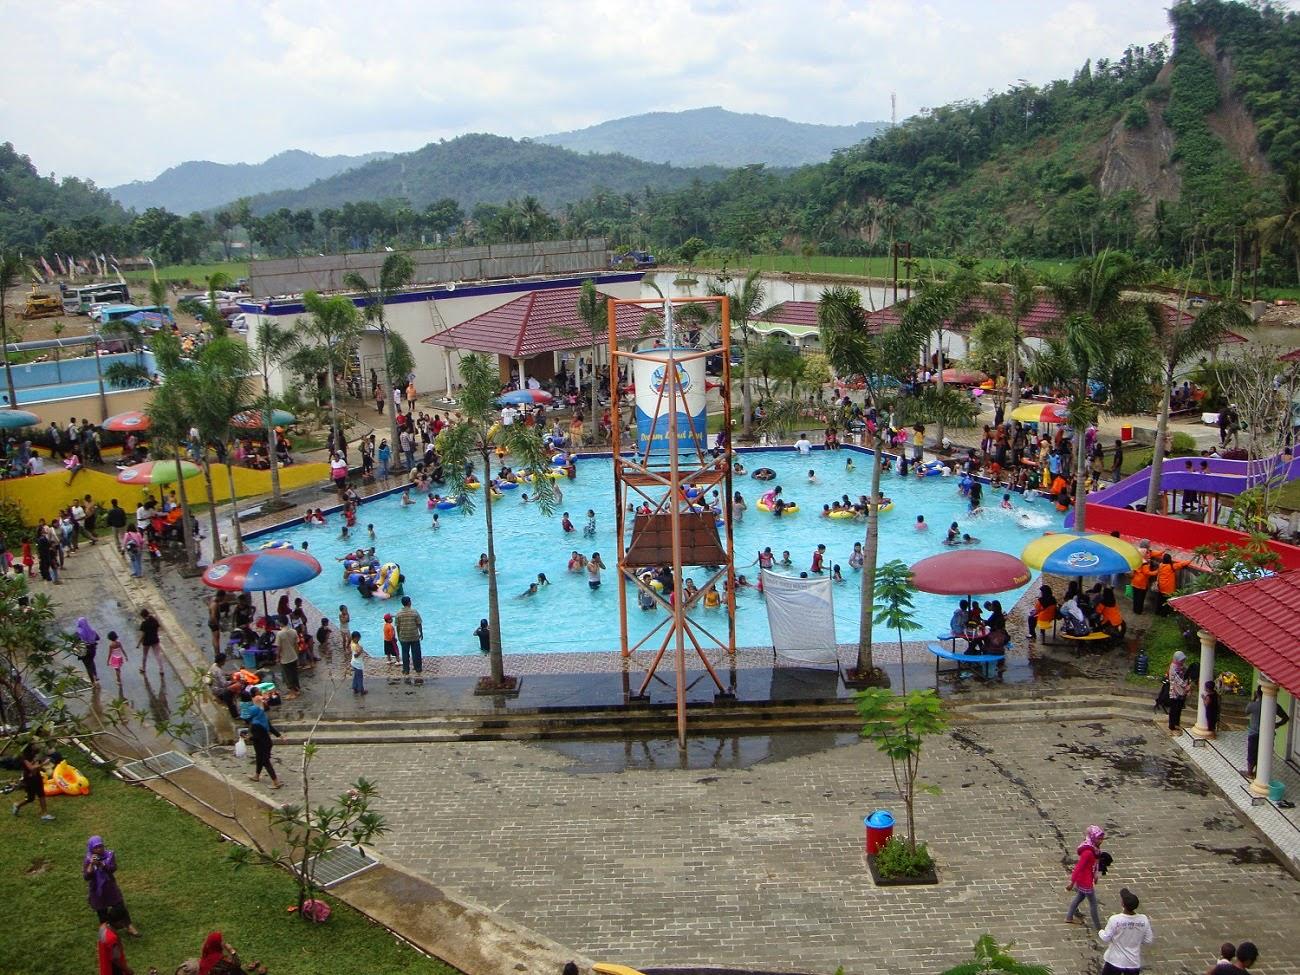 Kawasan Wisata Air Dream Land Pemerintah Kabupaten Banyumas Dreamland Waterpark